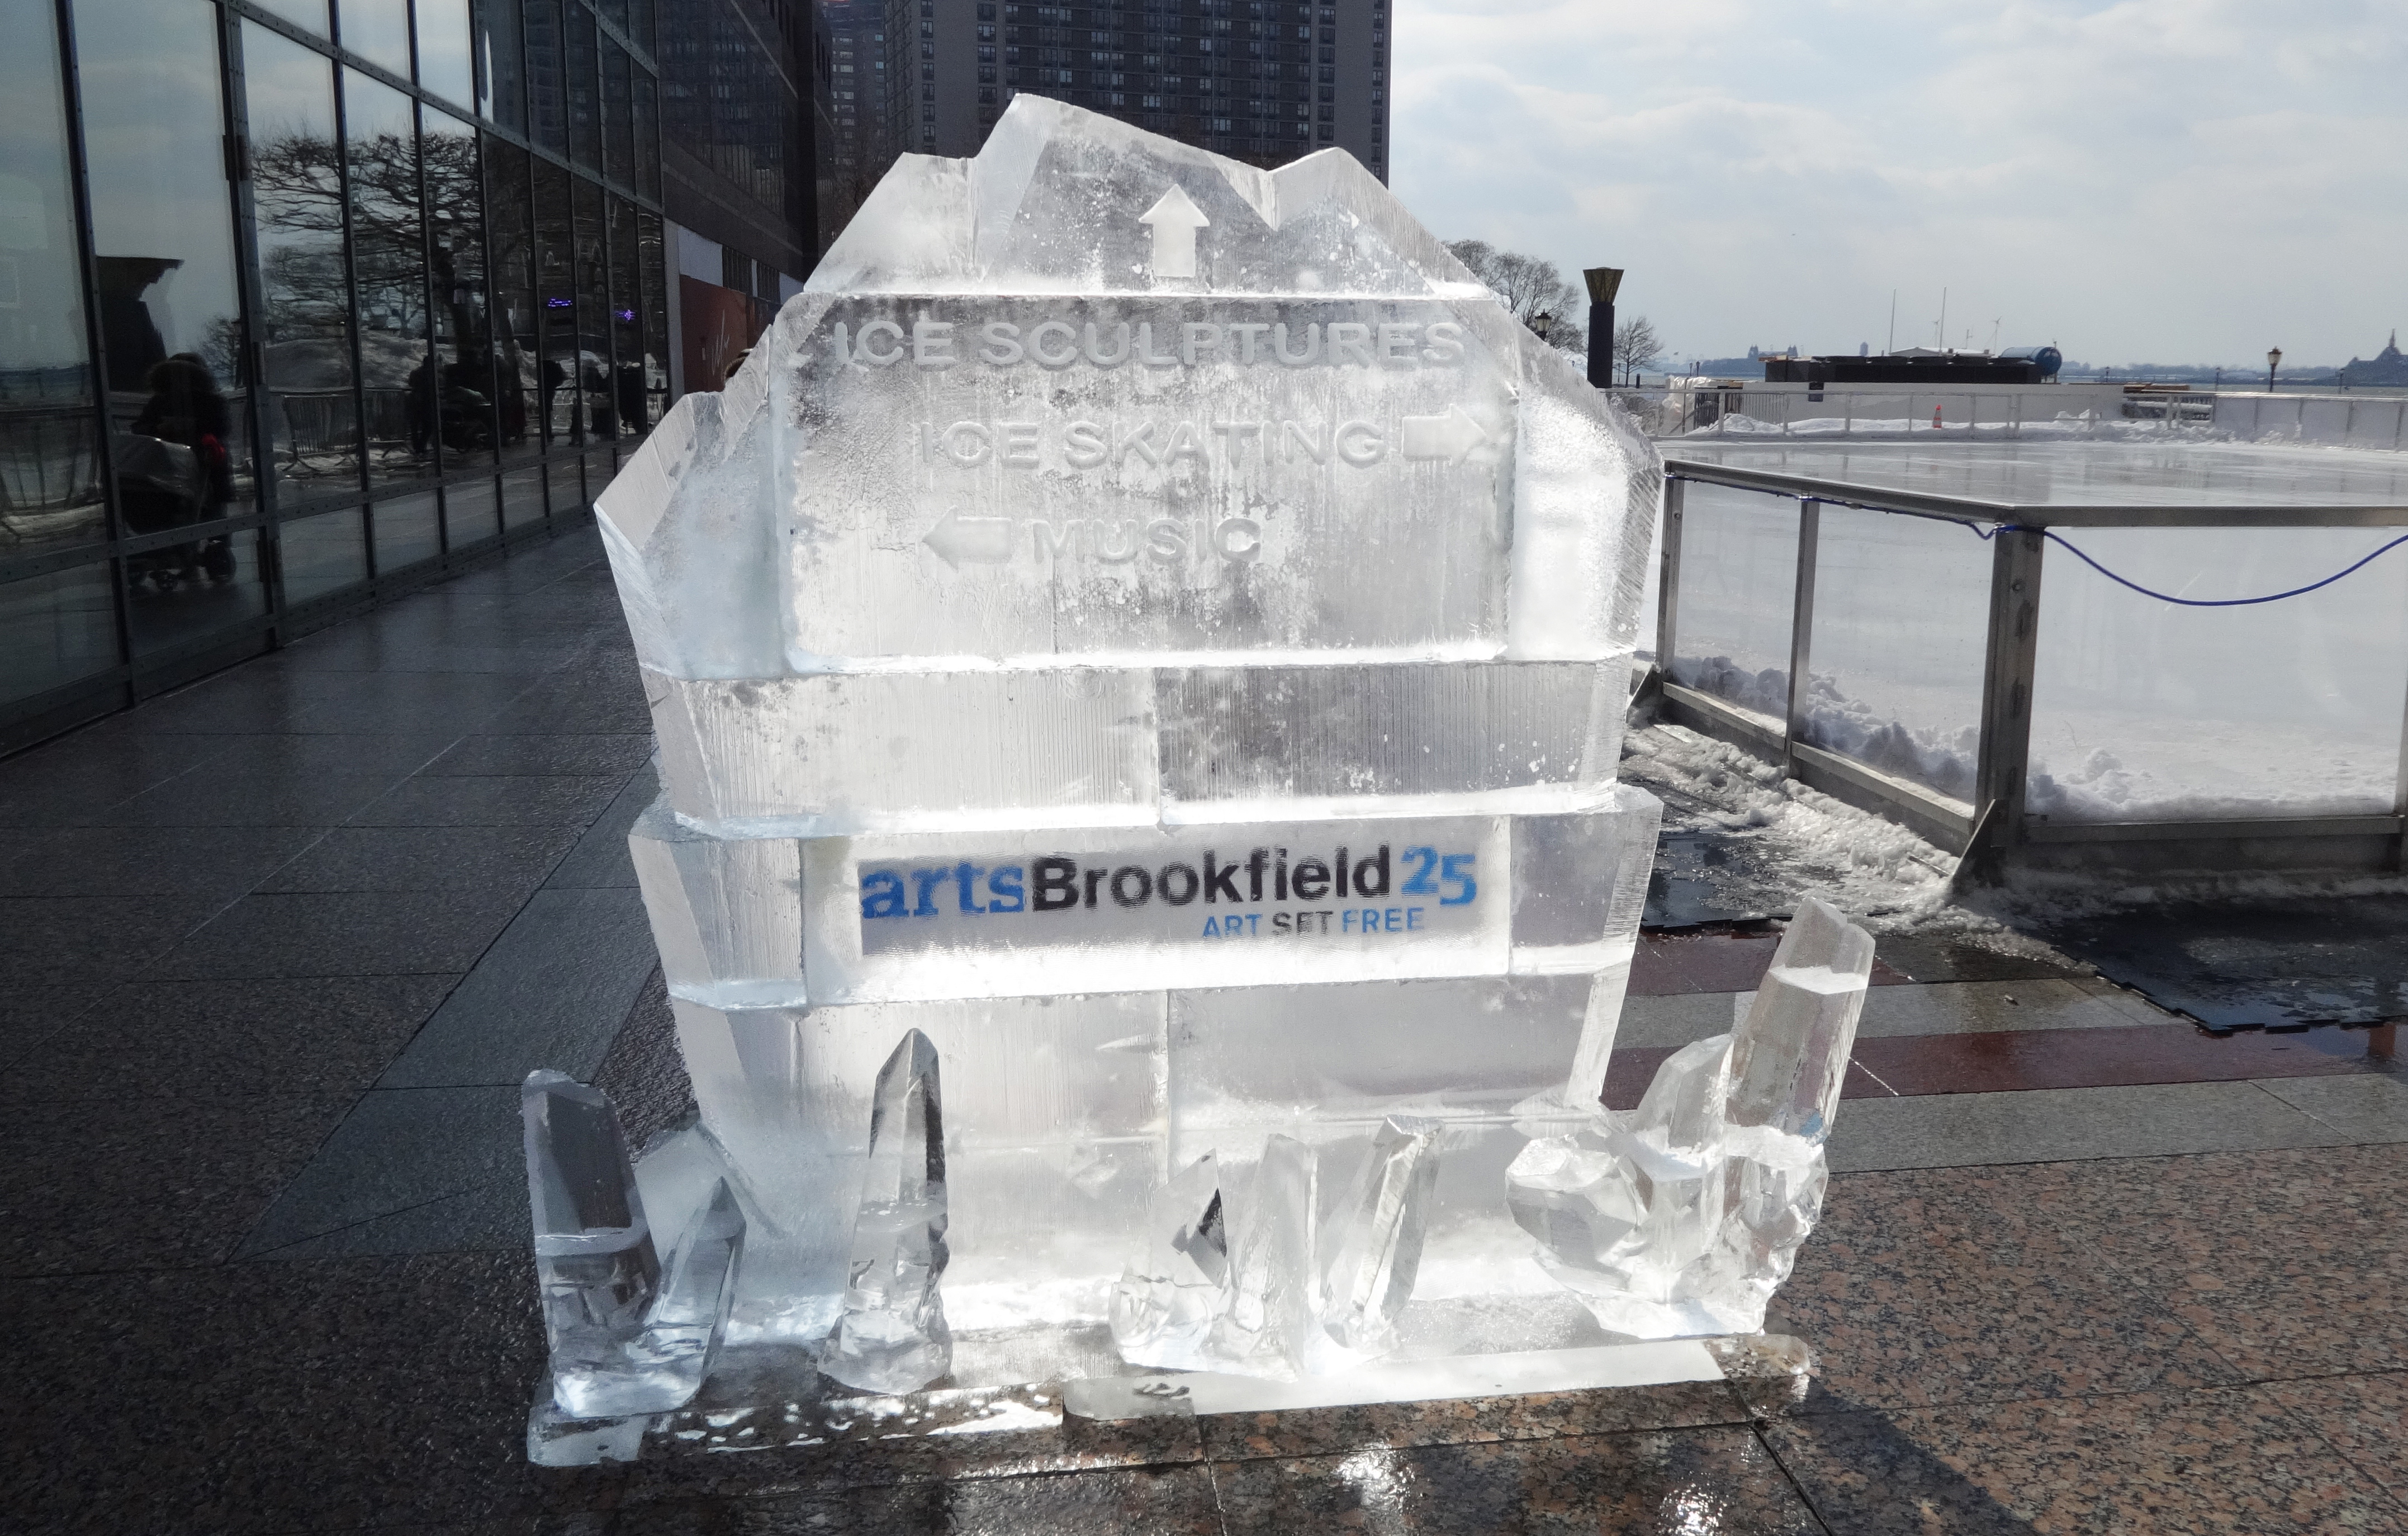 Brookfield ice sign